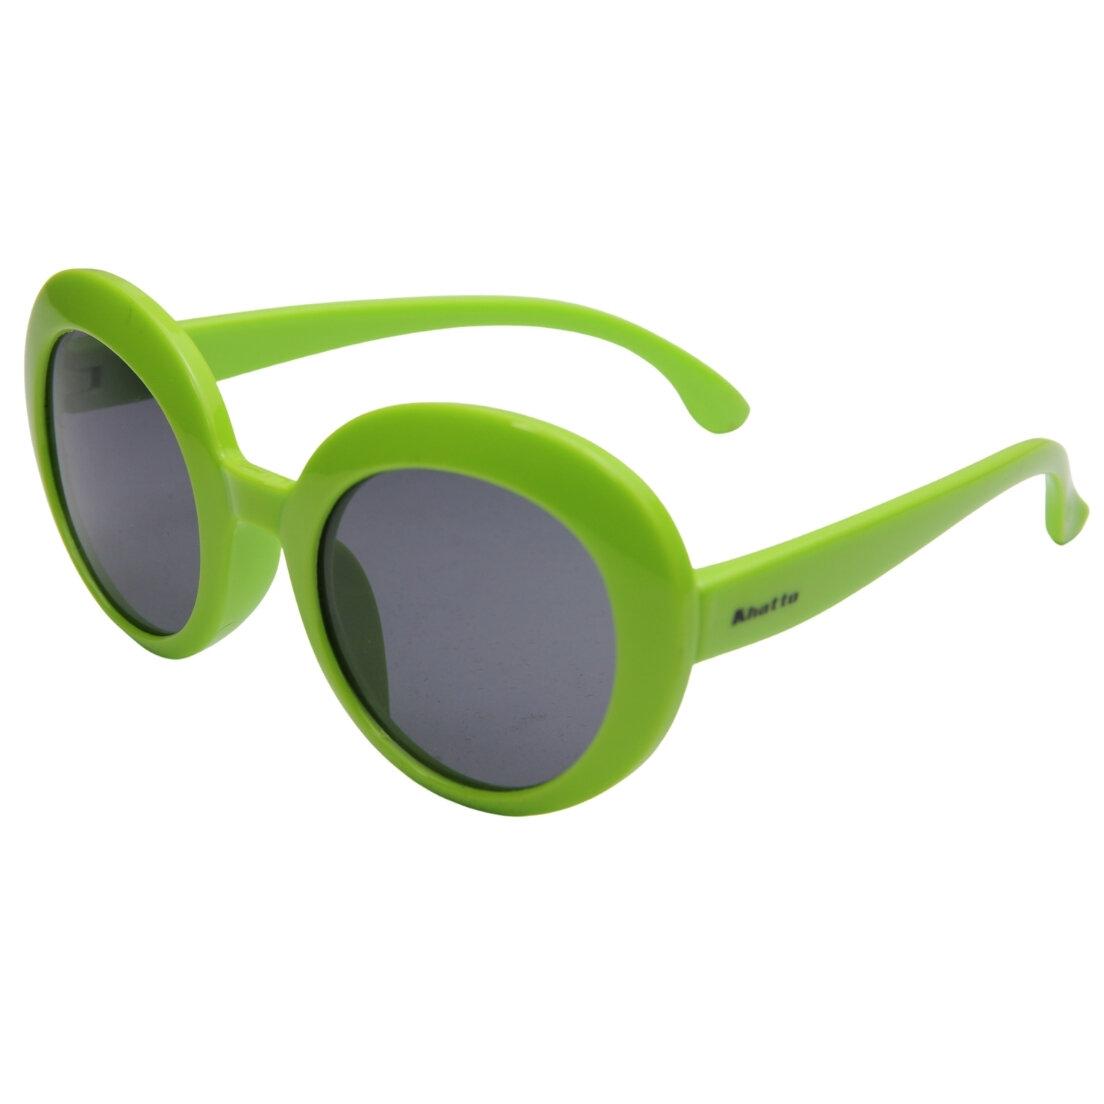 Óculos de Sol Khatto Kids Retrô Bruninha - C037